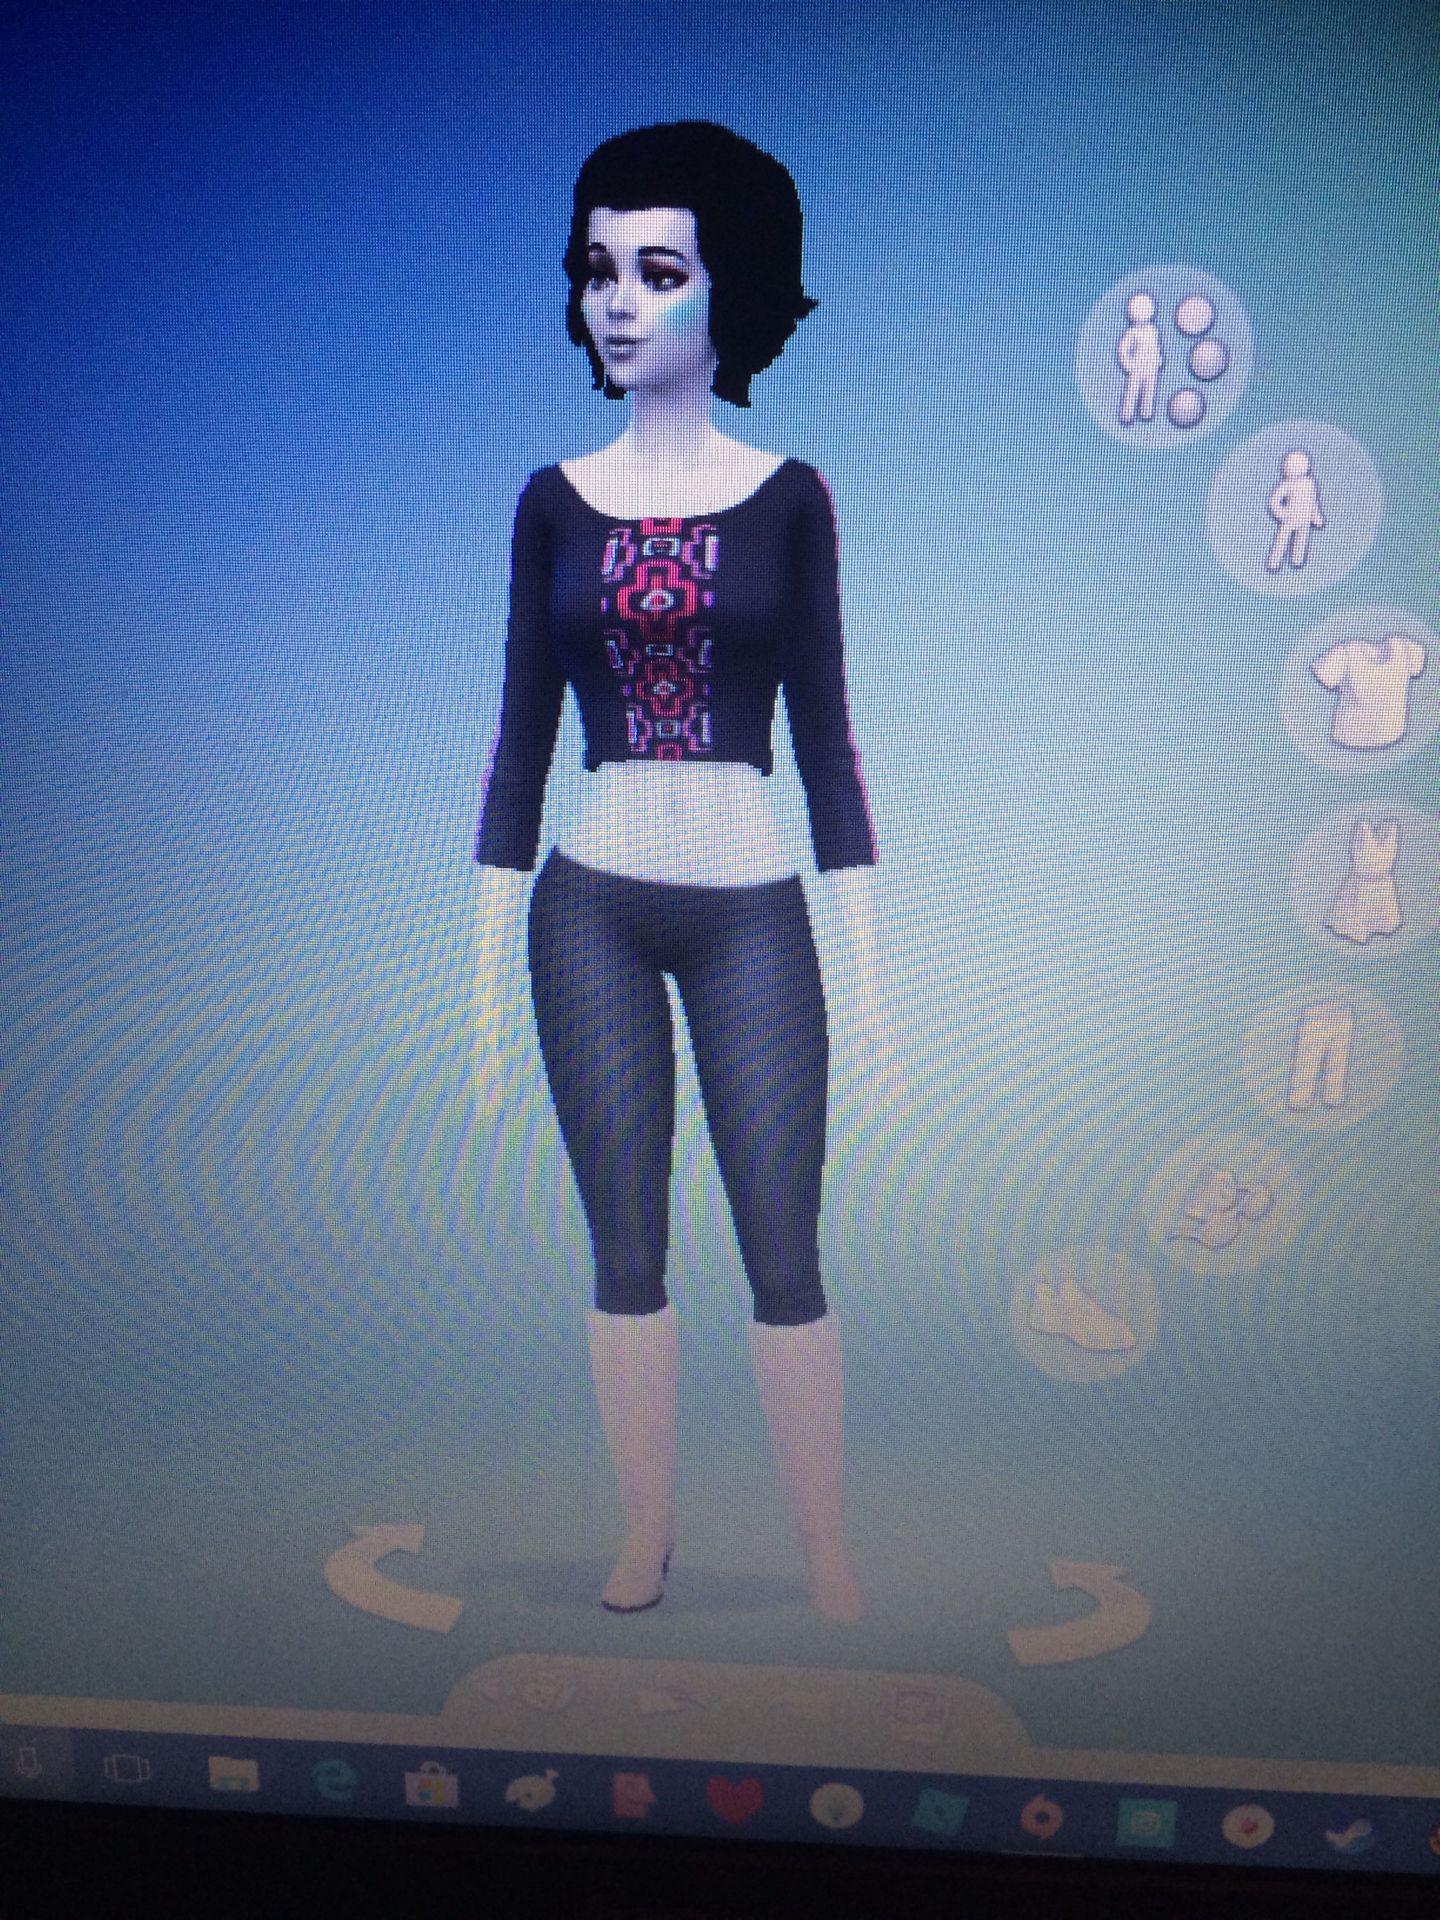 Stuff I Made For The Sims 4 - #6 - Mettaton - Wattpad